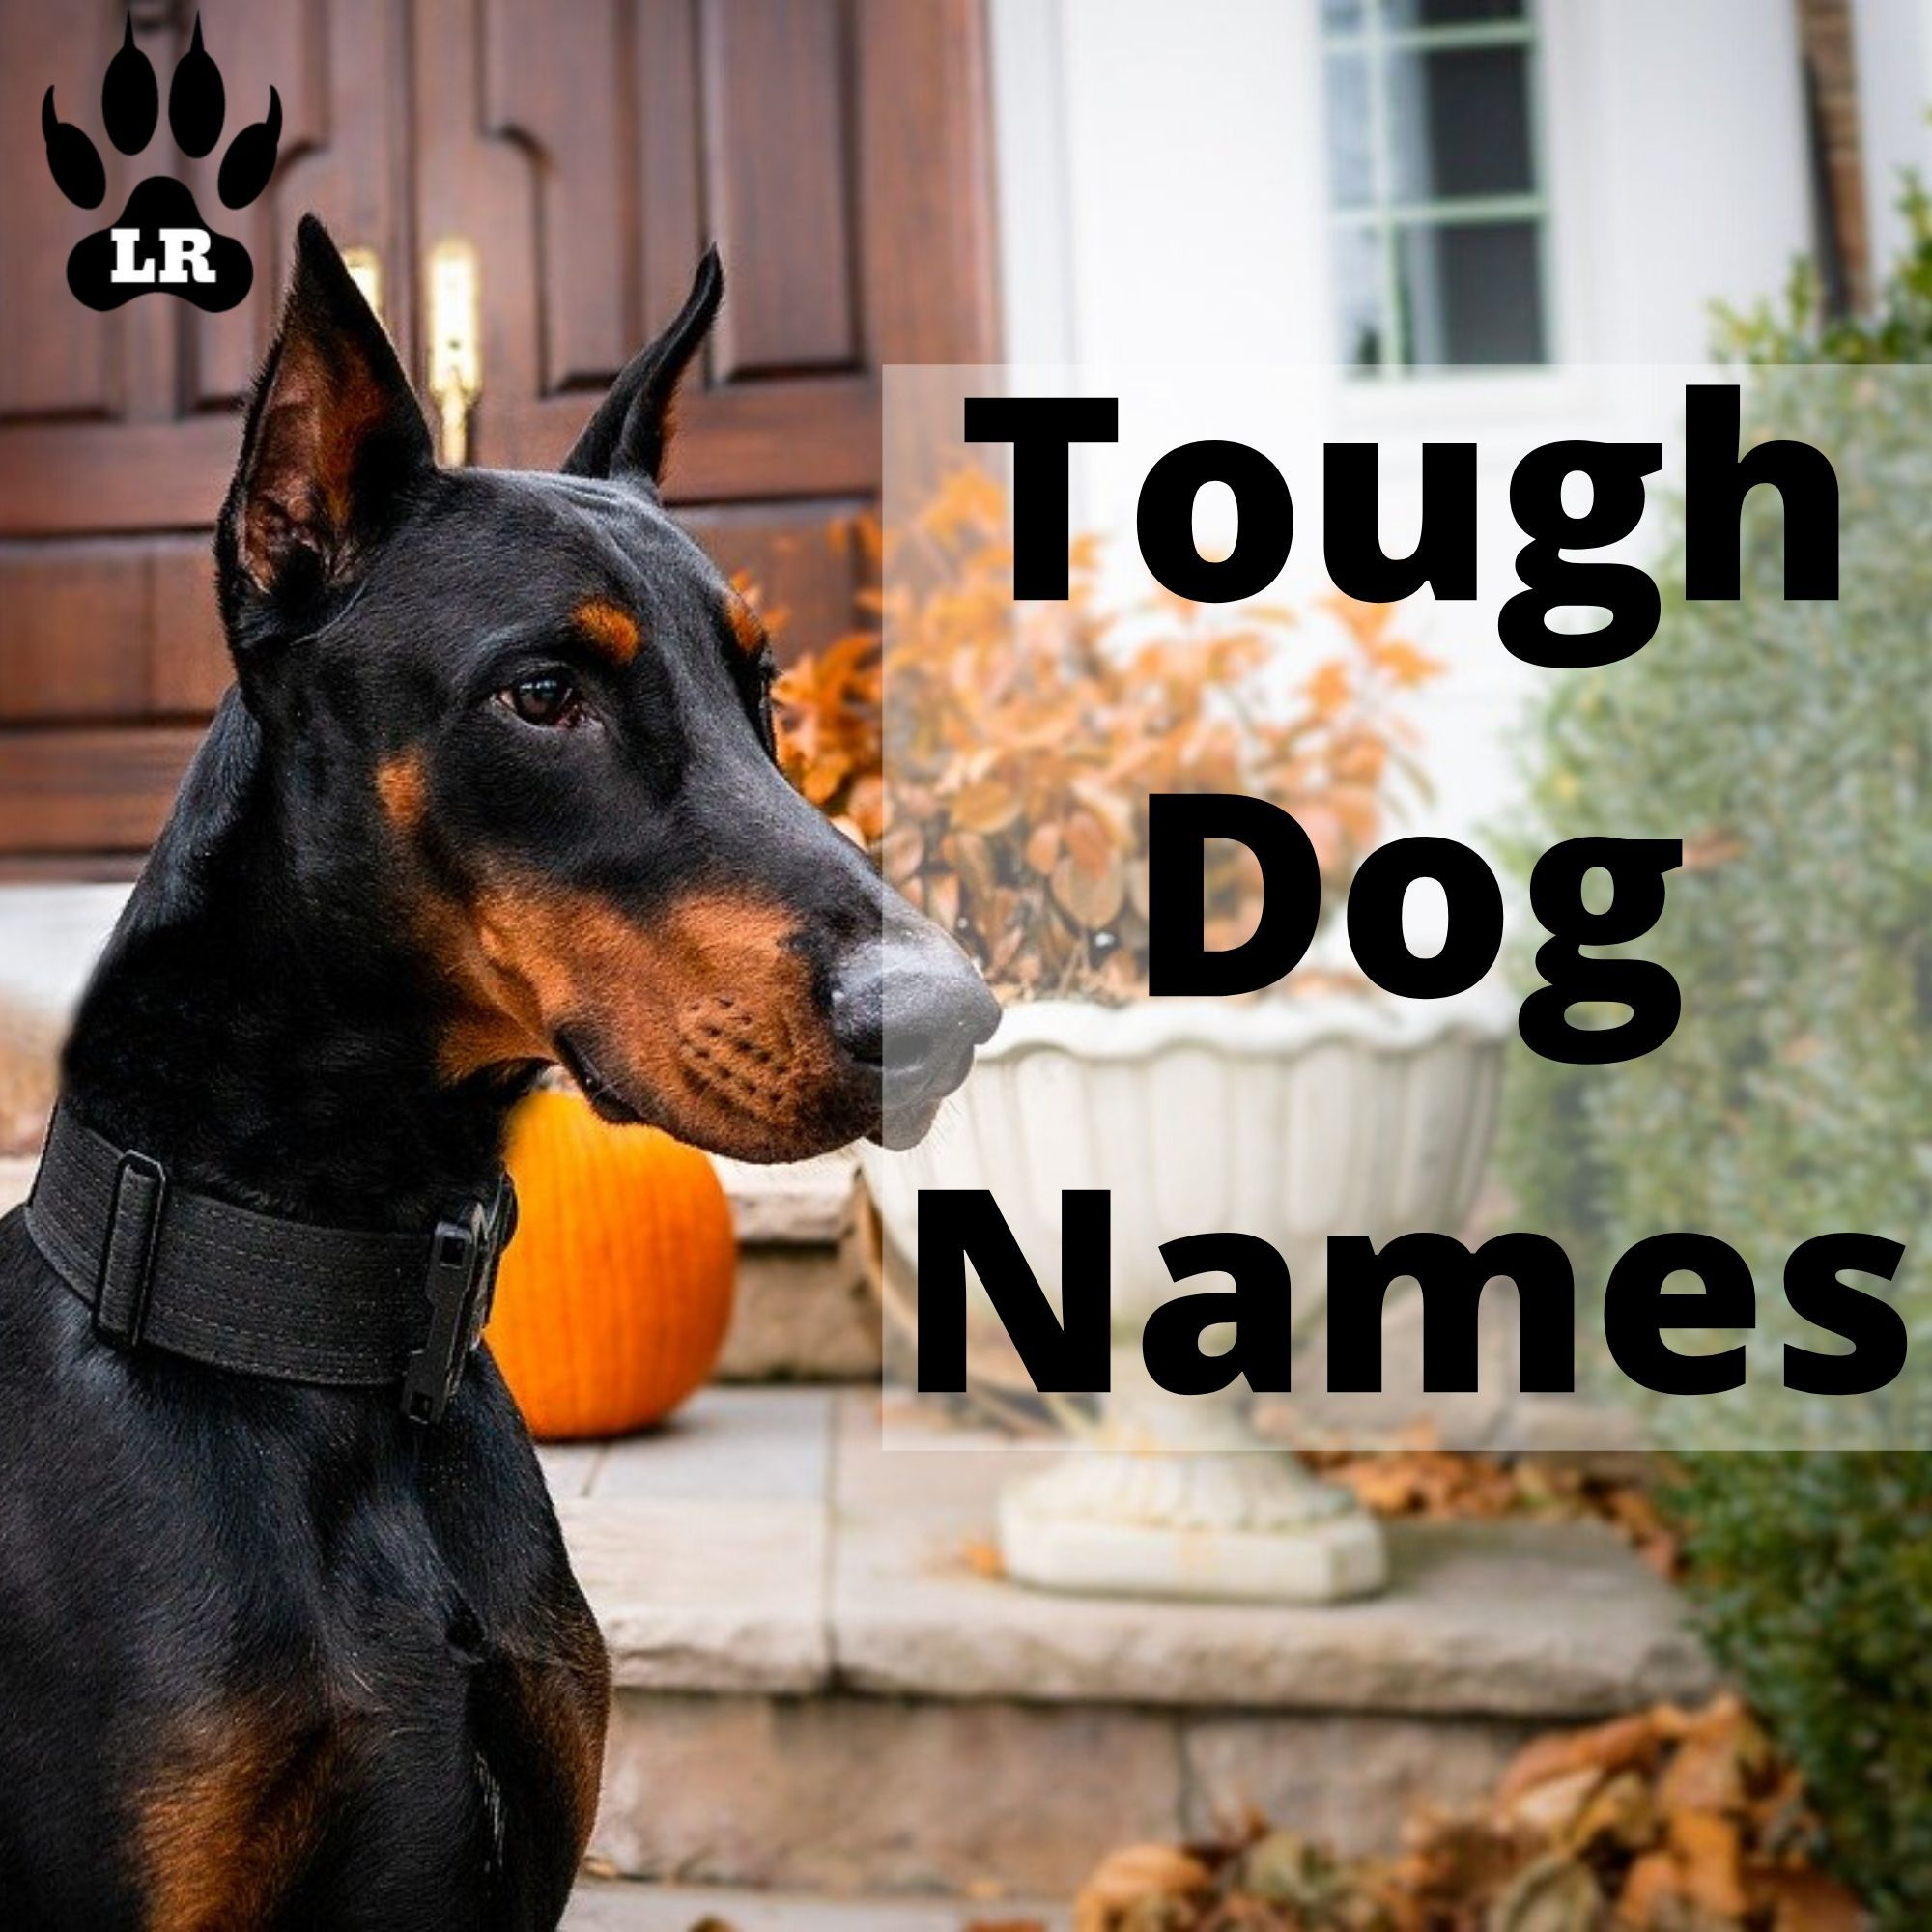 160 Tough Dog Names Labrottie Com In 2020 Tough Dog Names Dog Names Female Dog Names